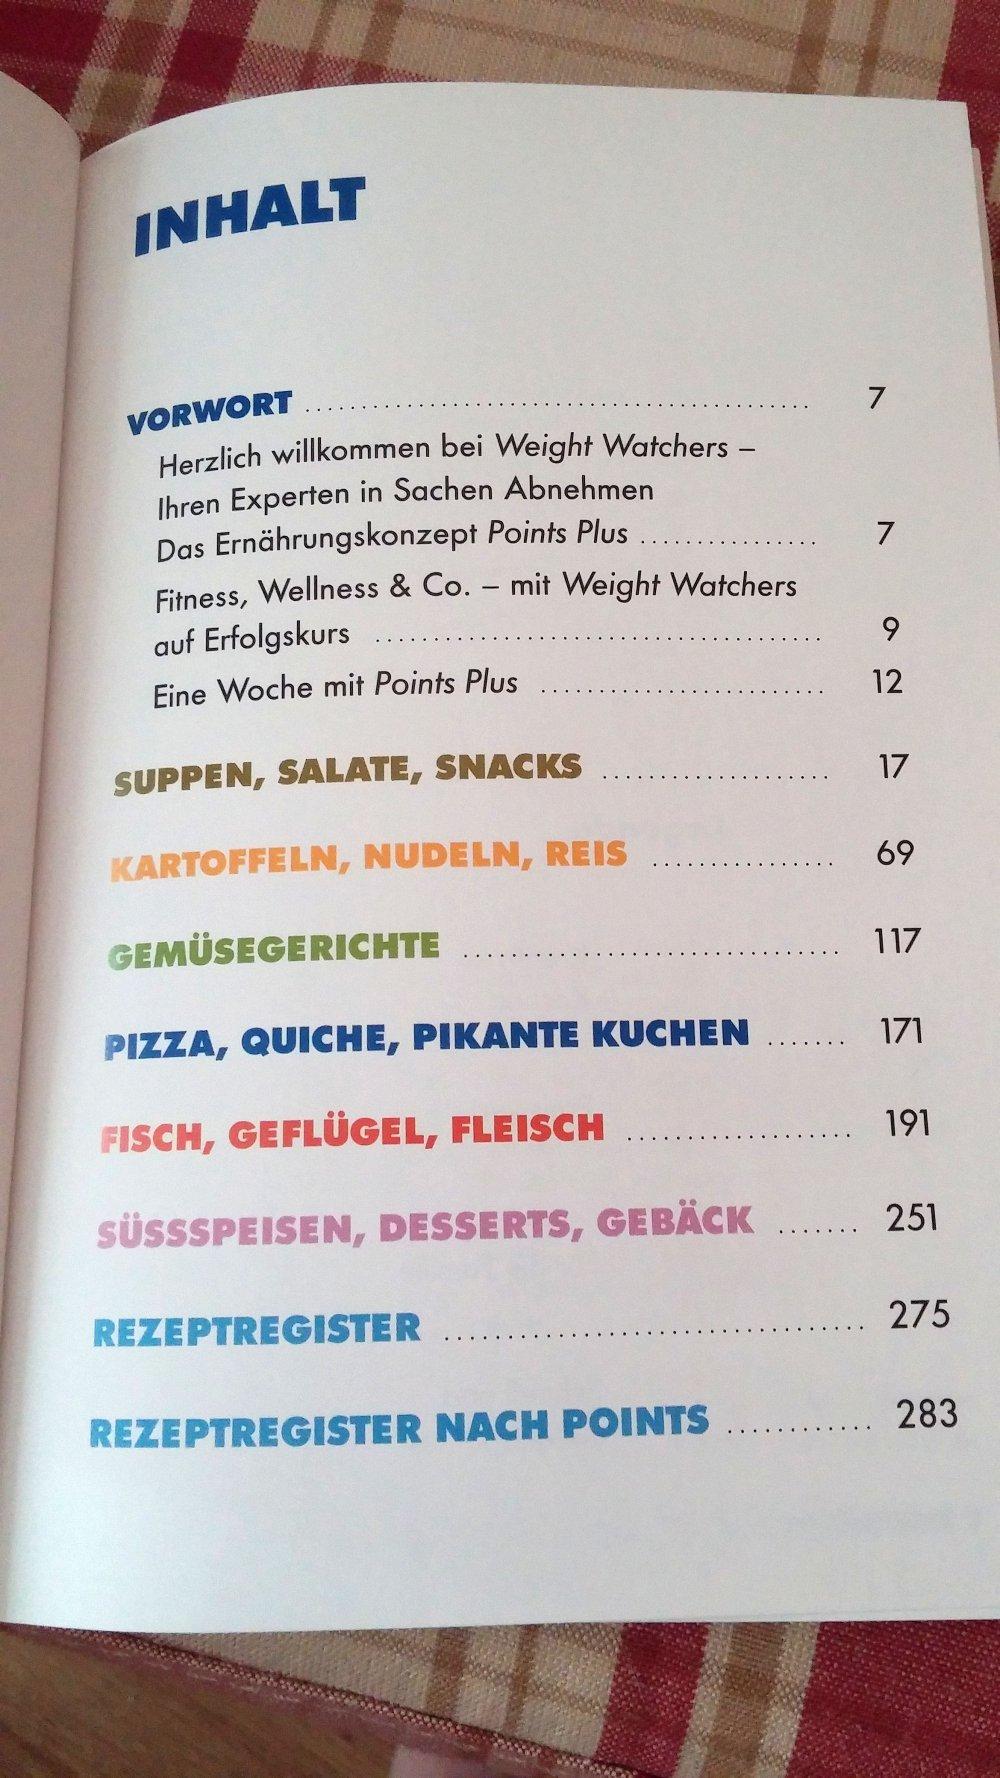 Weightwatcher kochbuch2 original kleiderkorb weightwatcher kochbuch2 original weightwatcher kochbuch2 original weightwatcher kochbuch2 original weightwatcher kochbuch2 original malvernweather Gallery